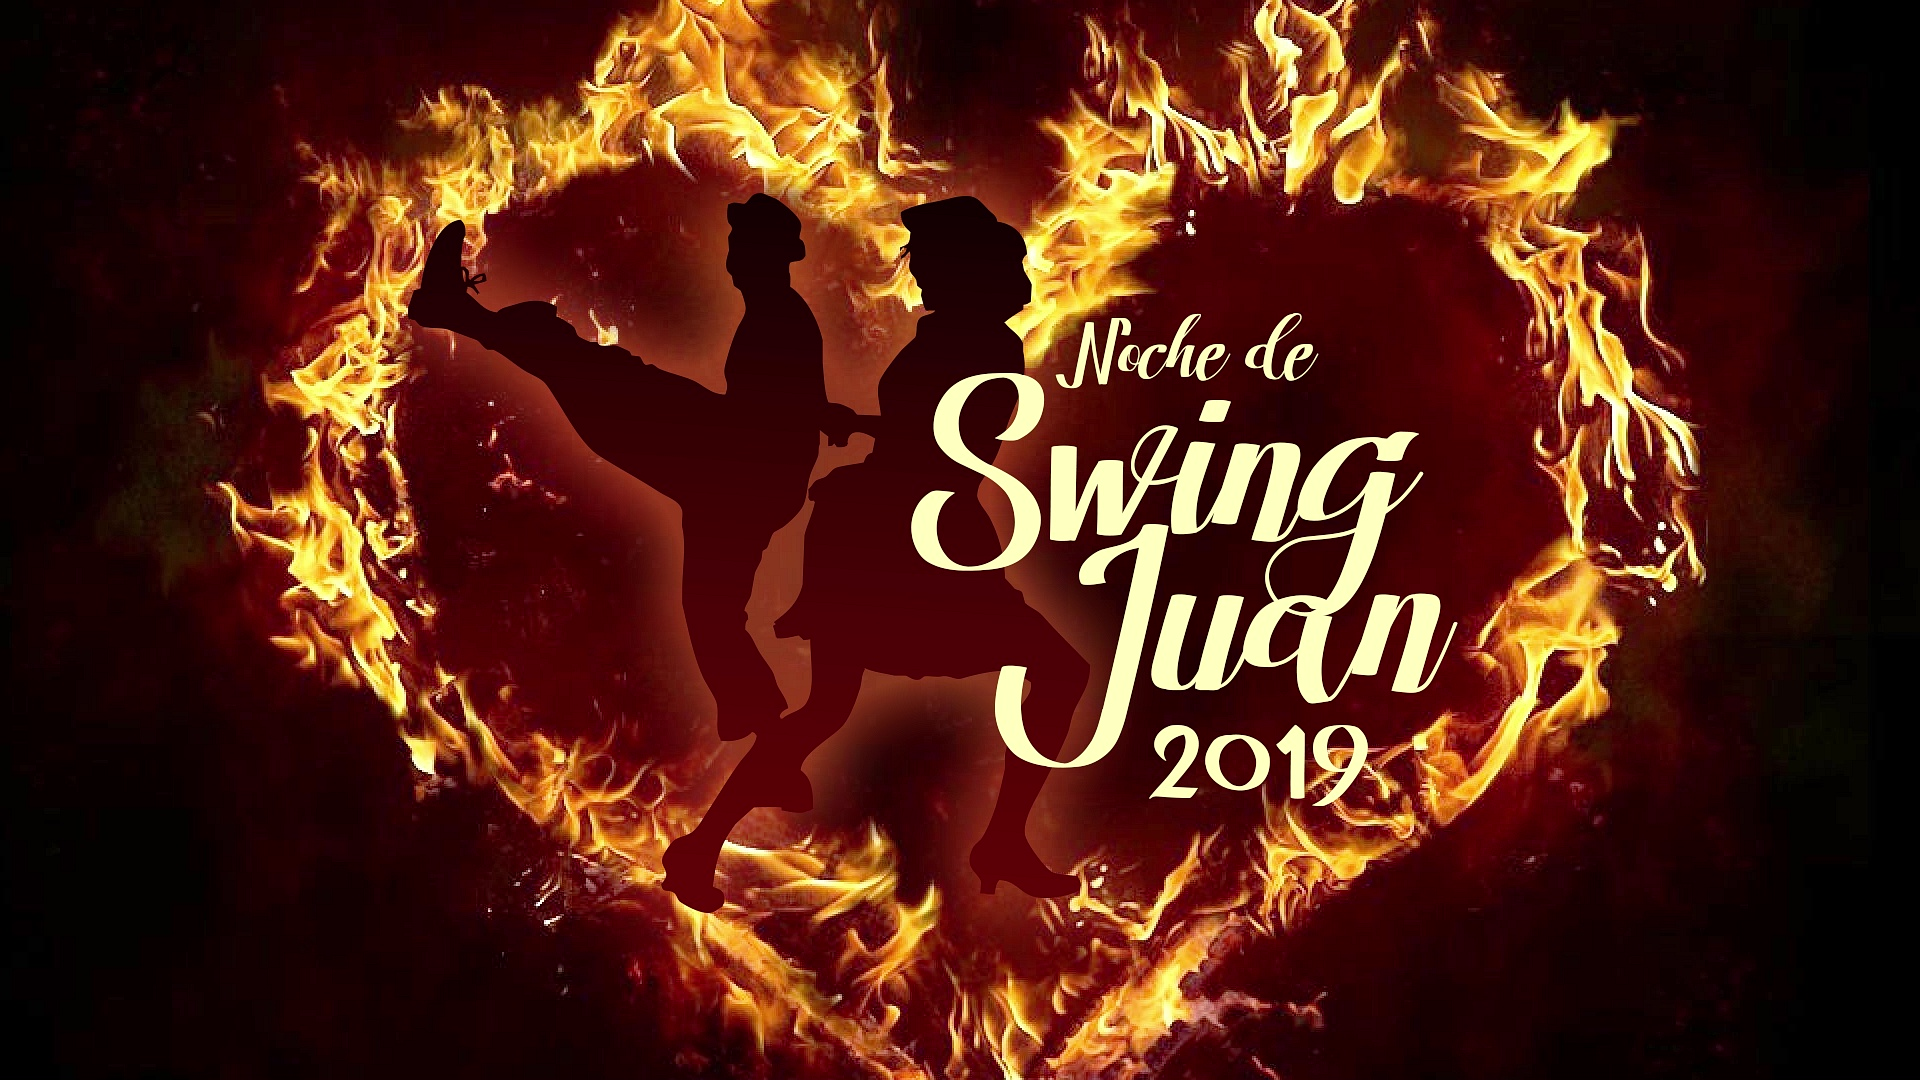 noche de swing juan 2019